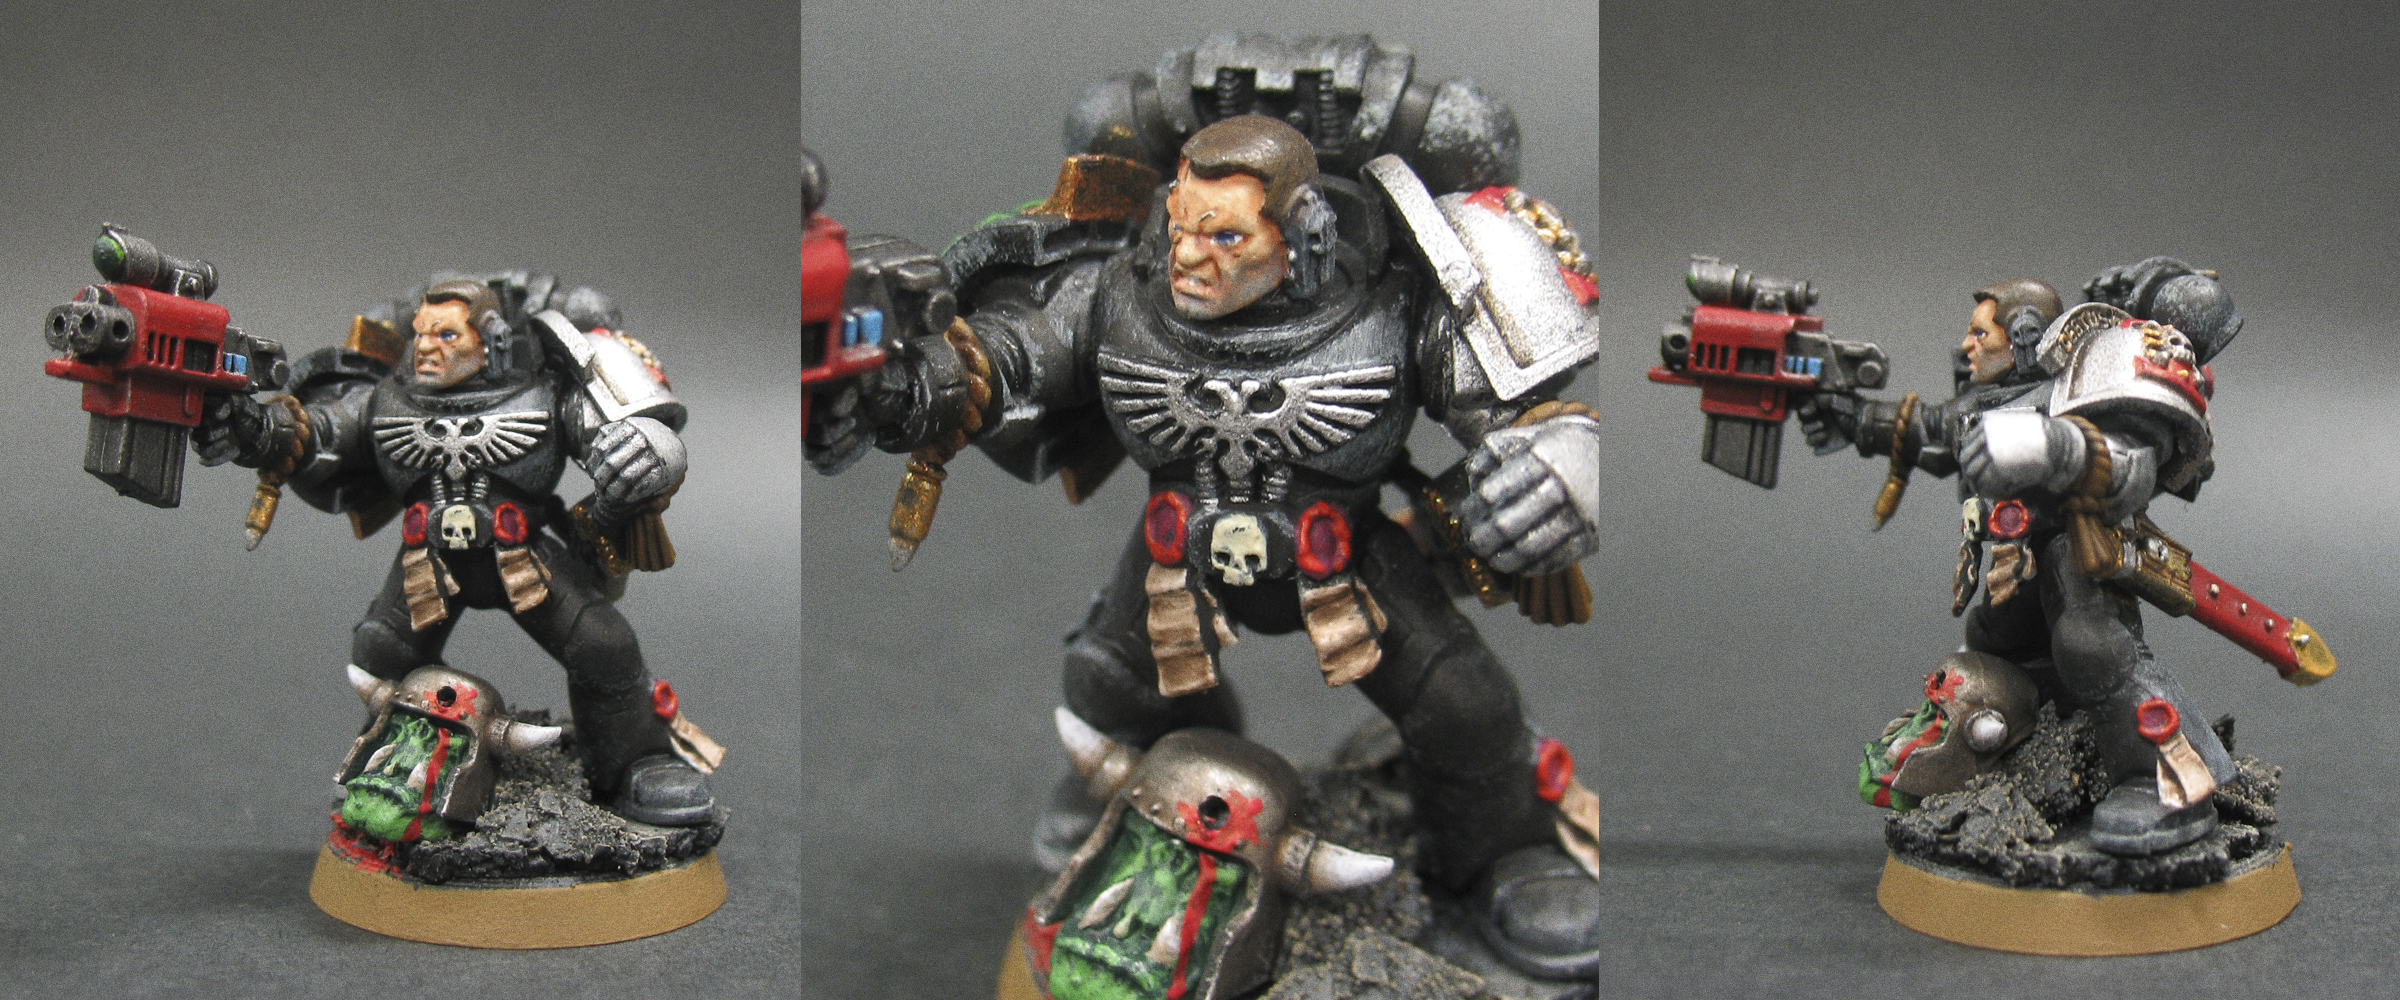 40k deathwatch captain titus by budsky on deviantart - Titus wallpaper ...